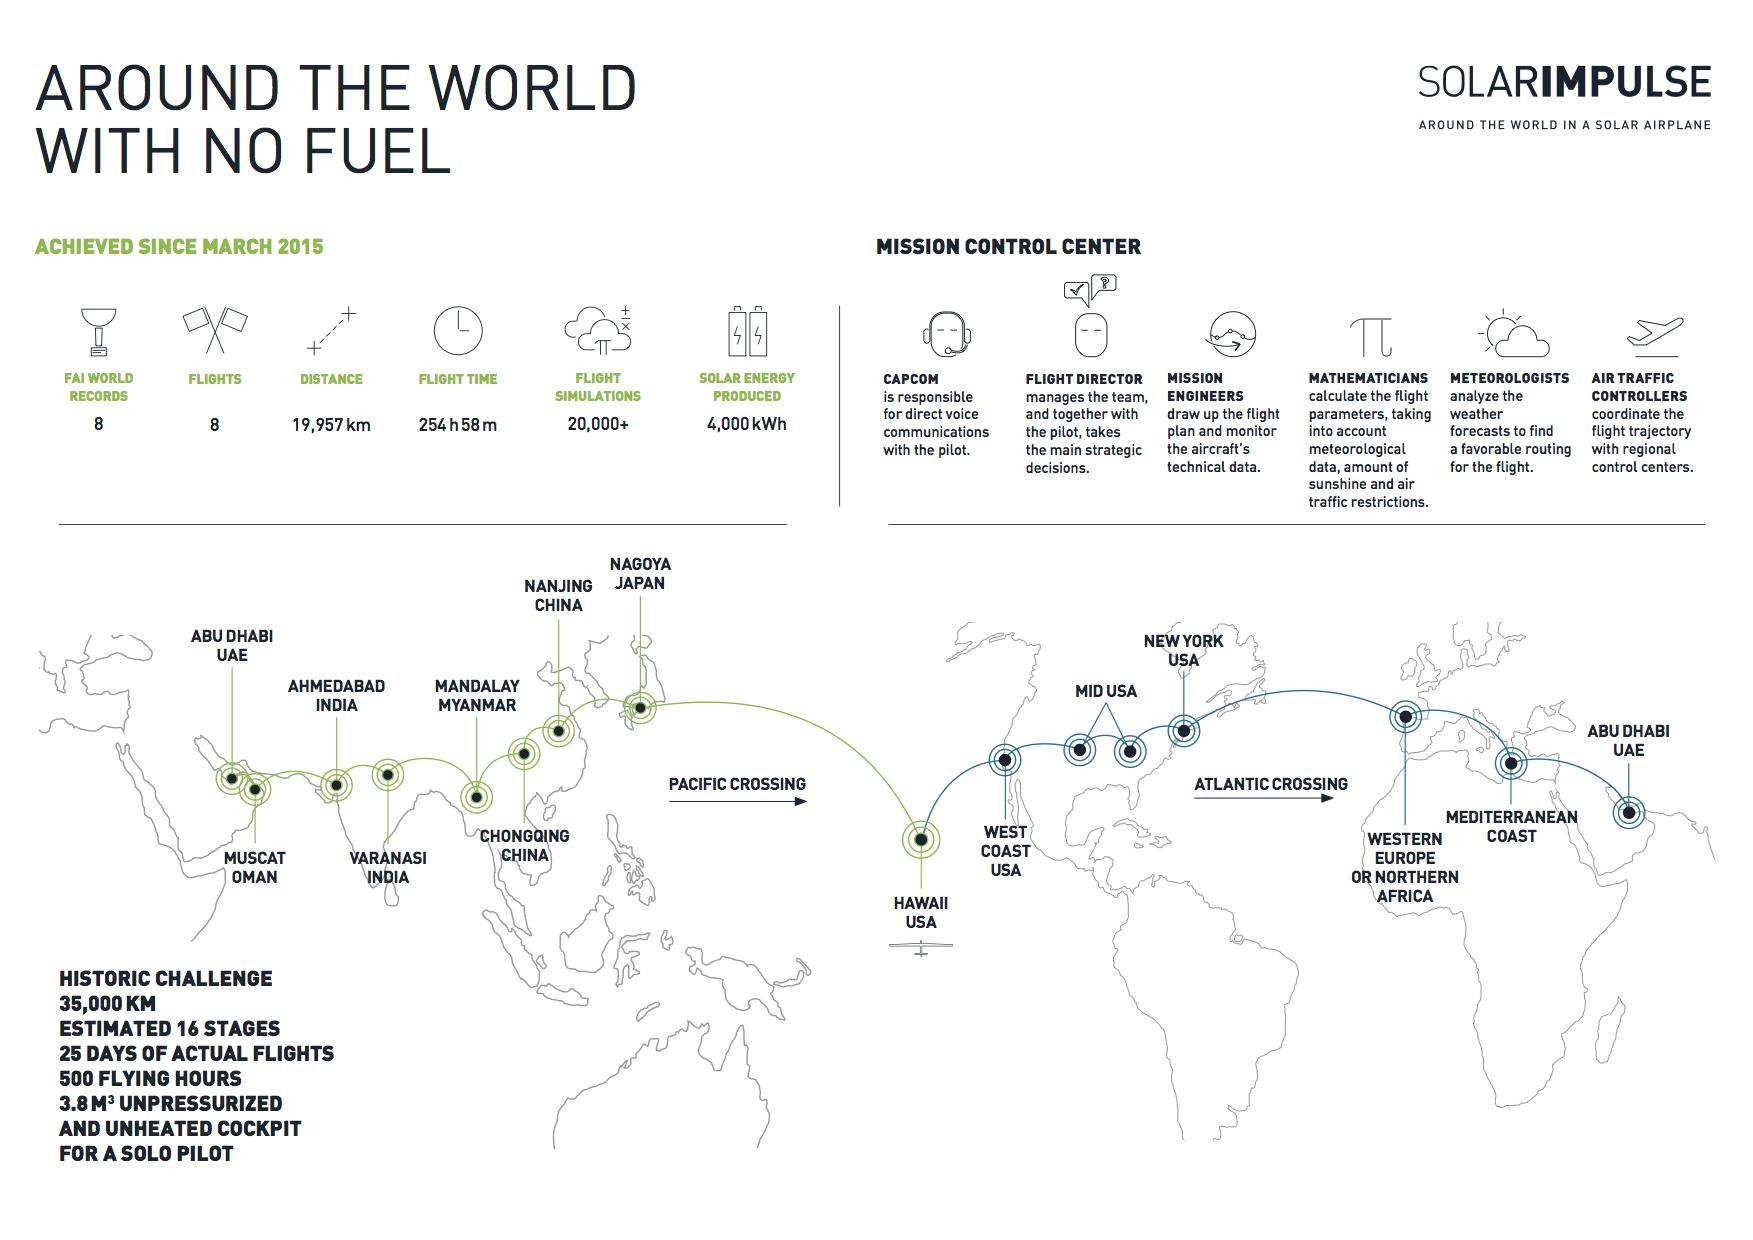 Solar Impulse's circumnavigation will require zero onboard fuel, but much expertise. Image: Solar Impulse